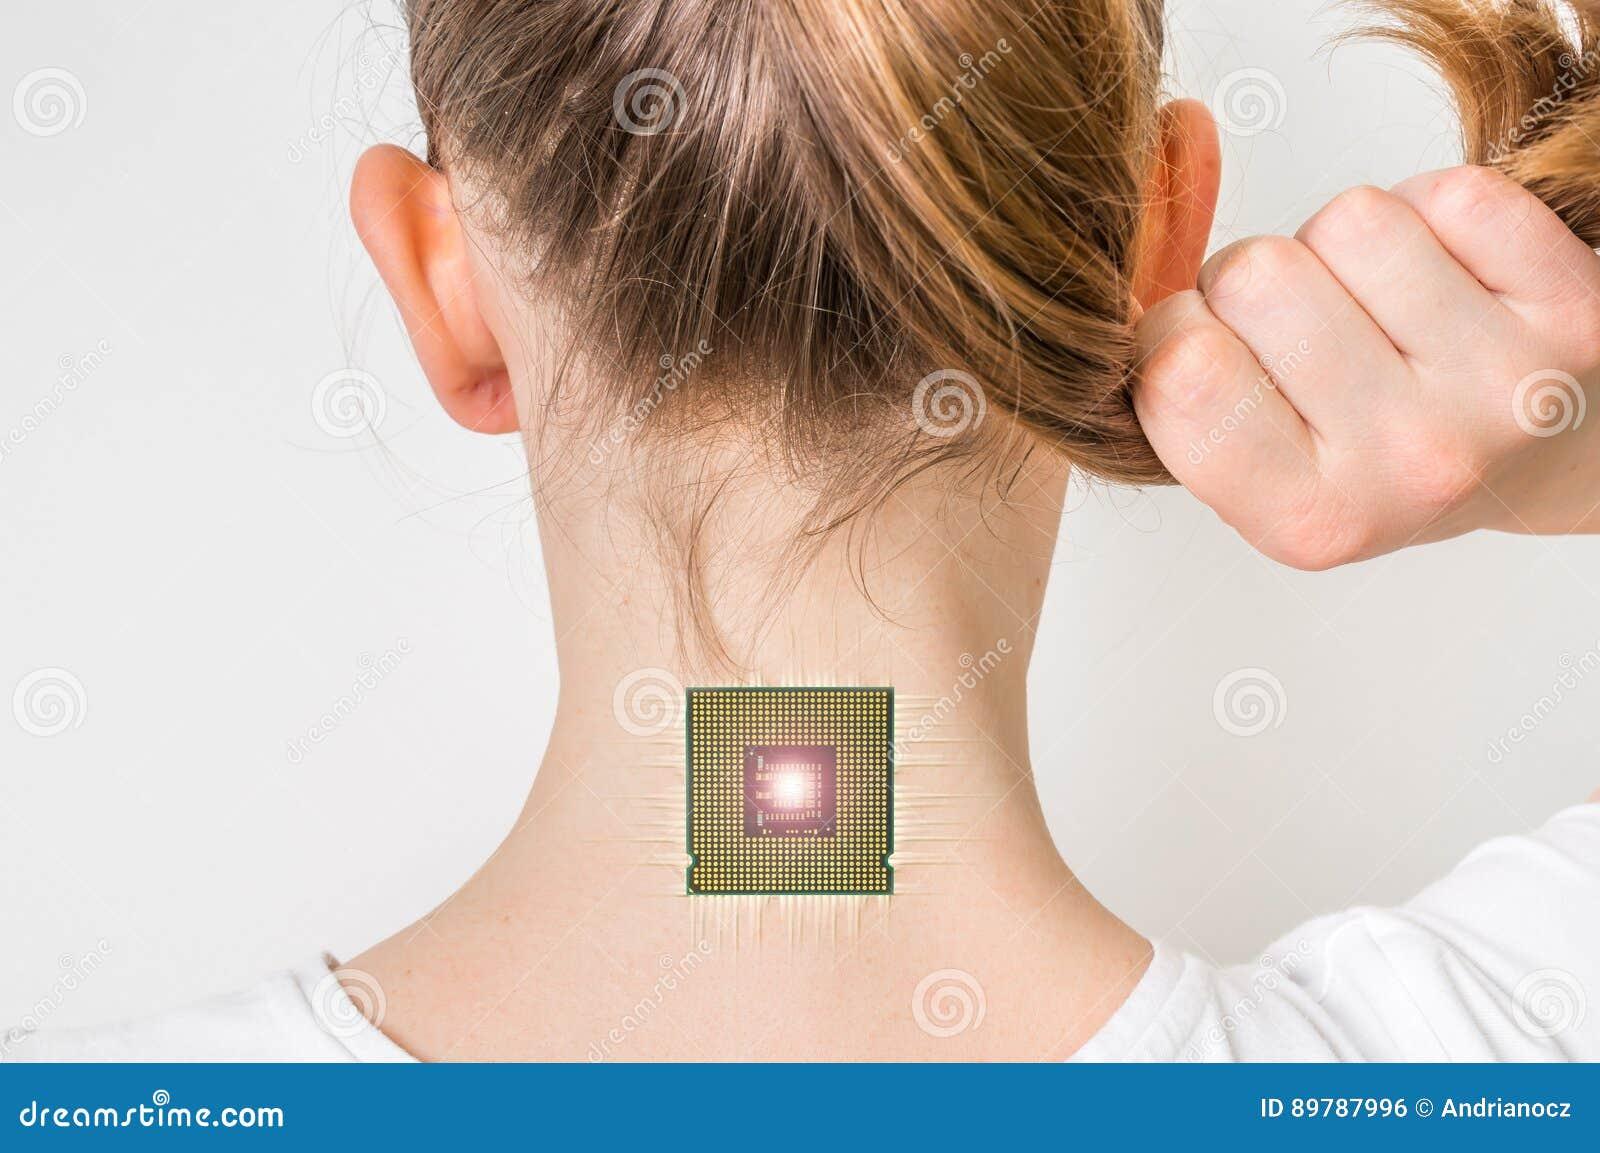 Bionic Microchip Inside Human Body Cybernetics Concept Stock Photo